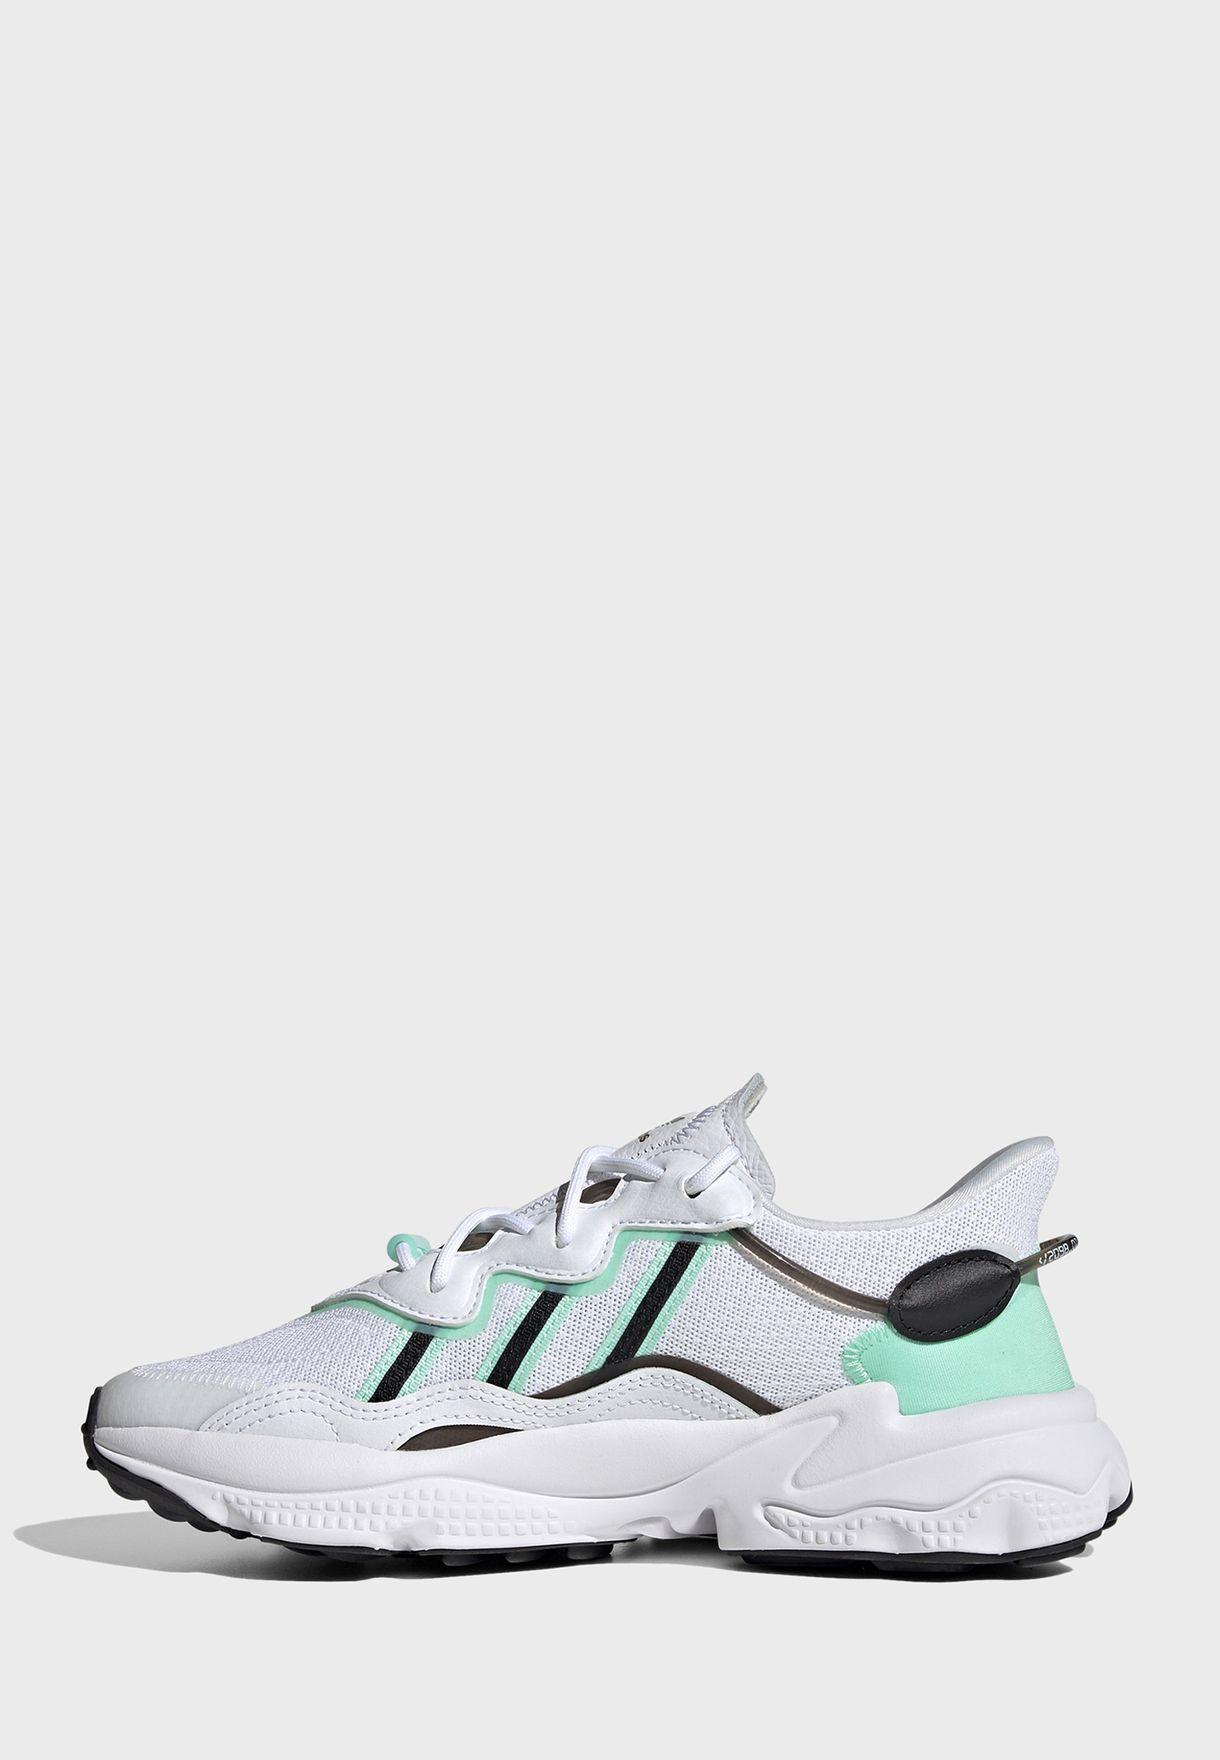 حذاء اوزيجو اوريجينالز للنساء